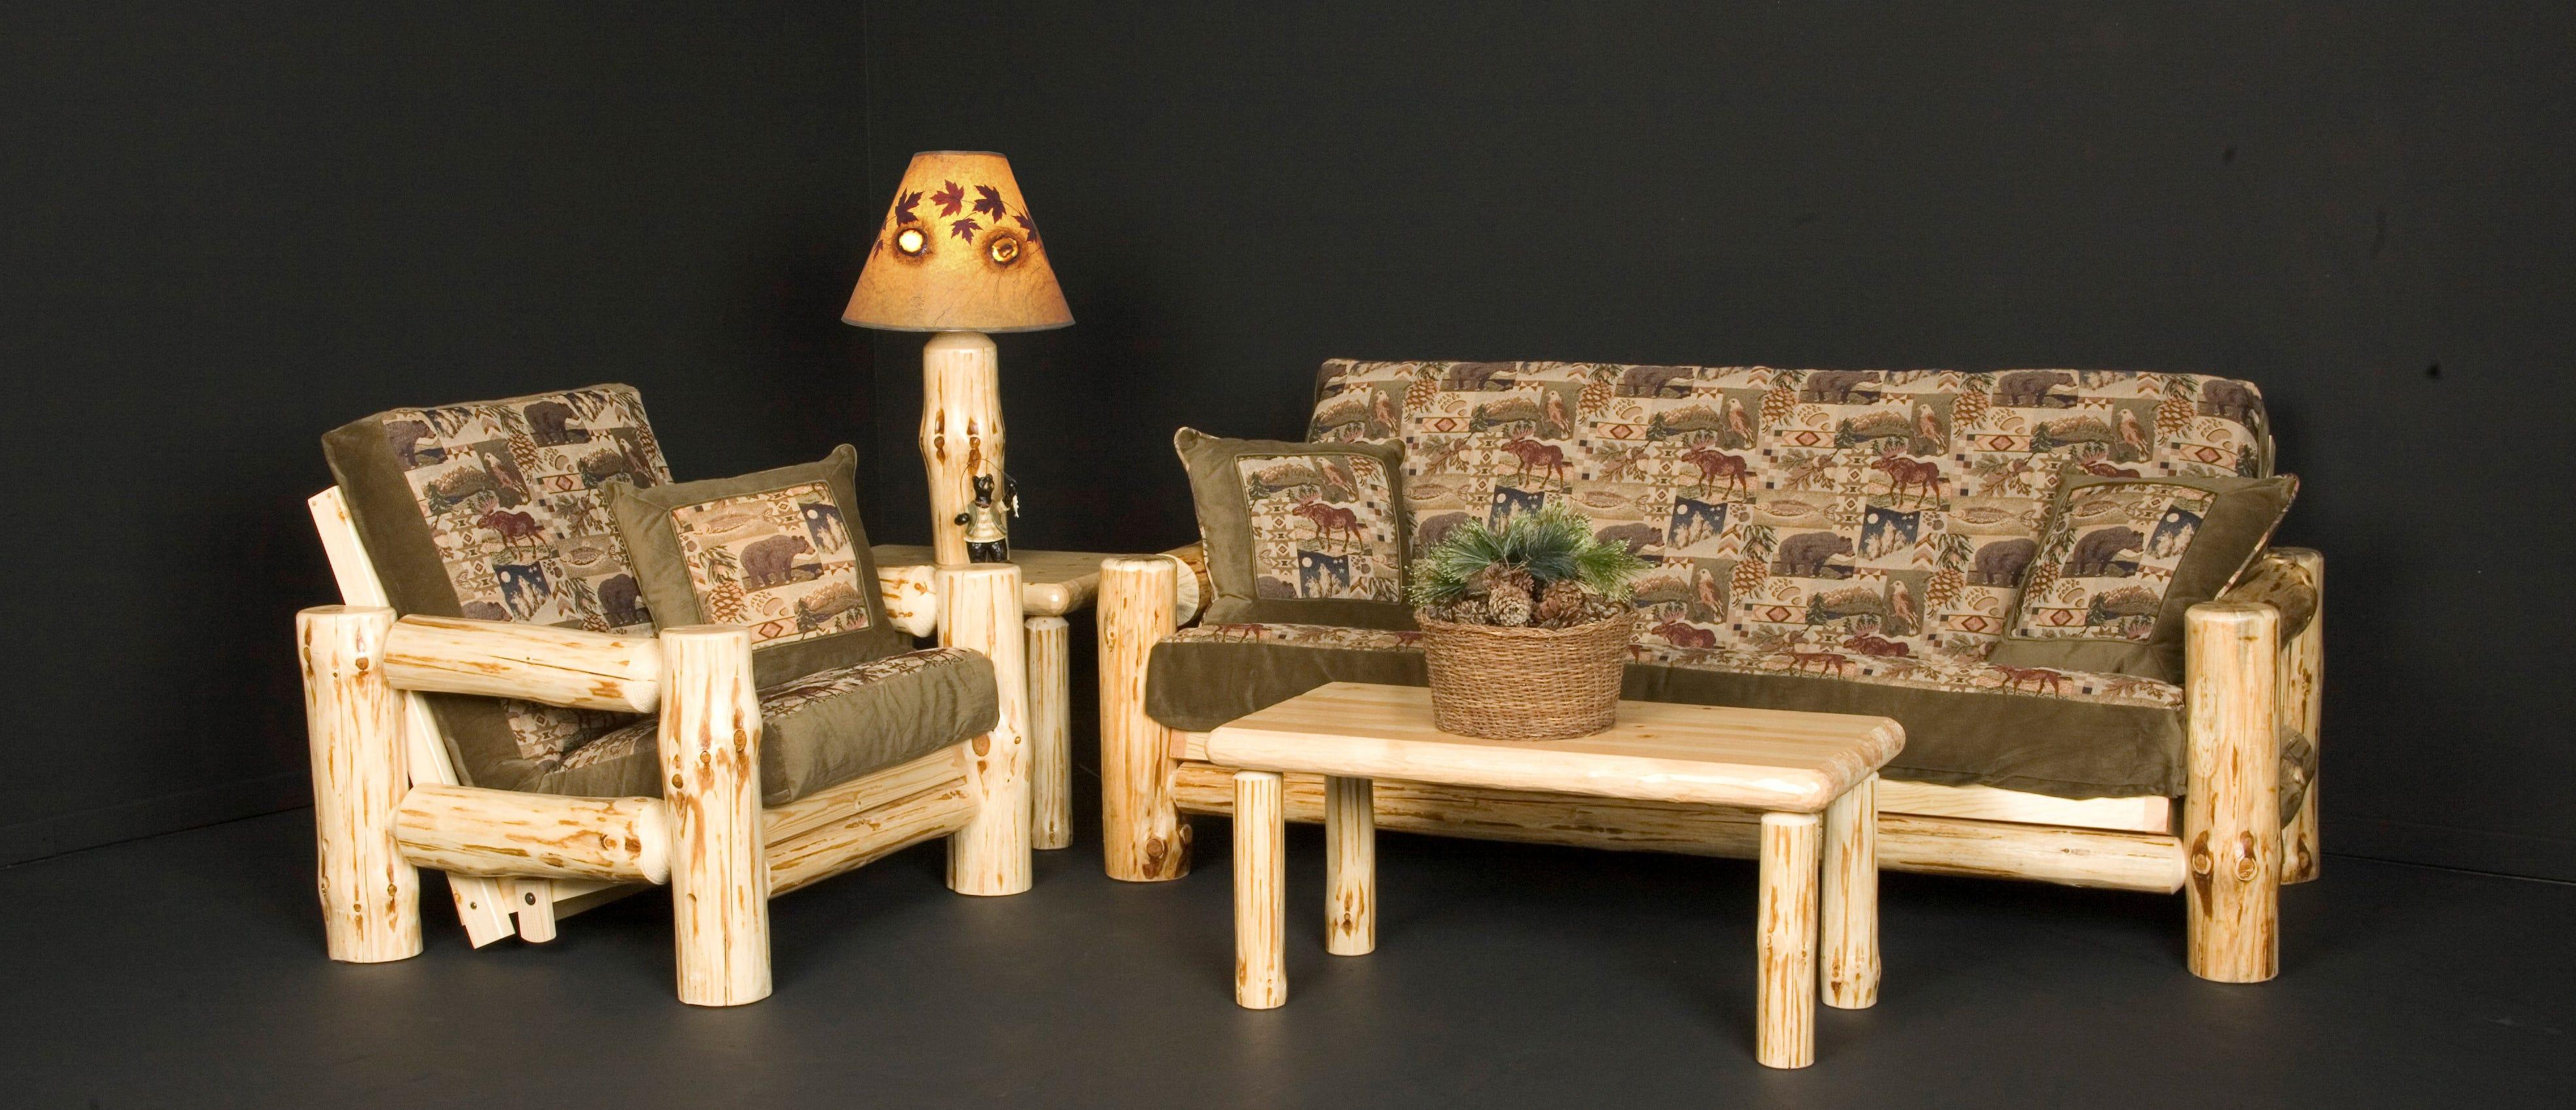 wilderness futon Agate Lamp Shade